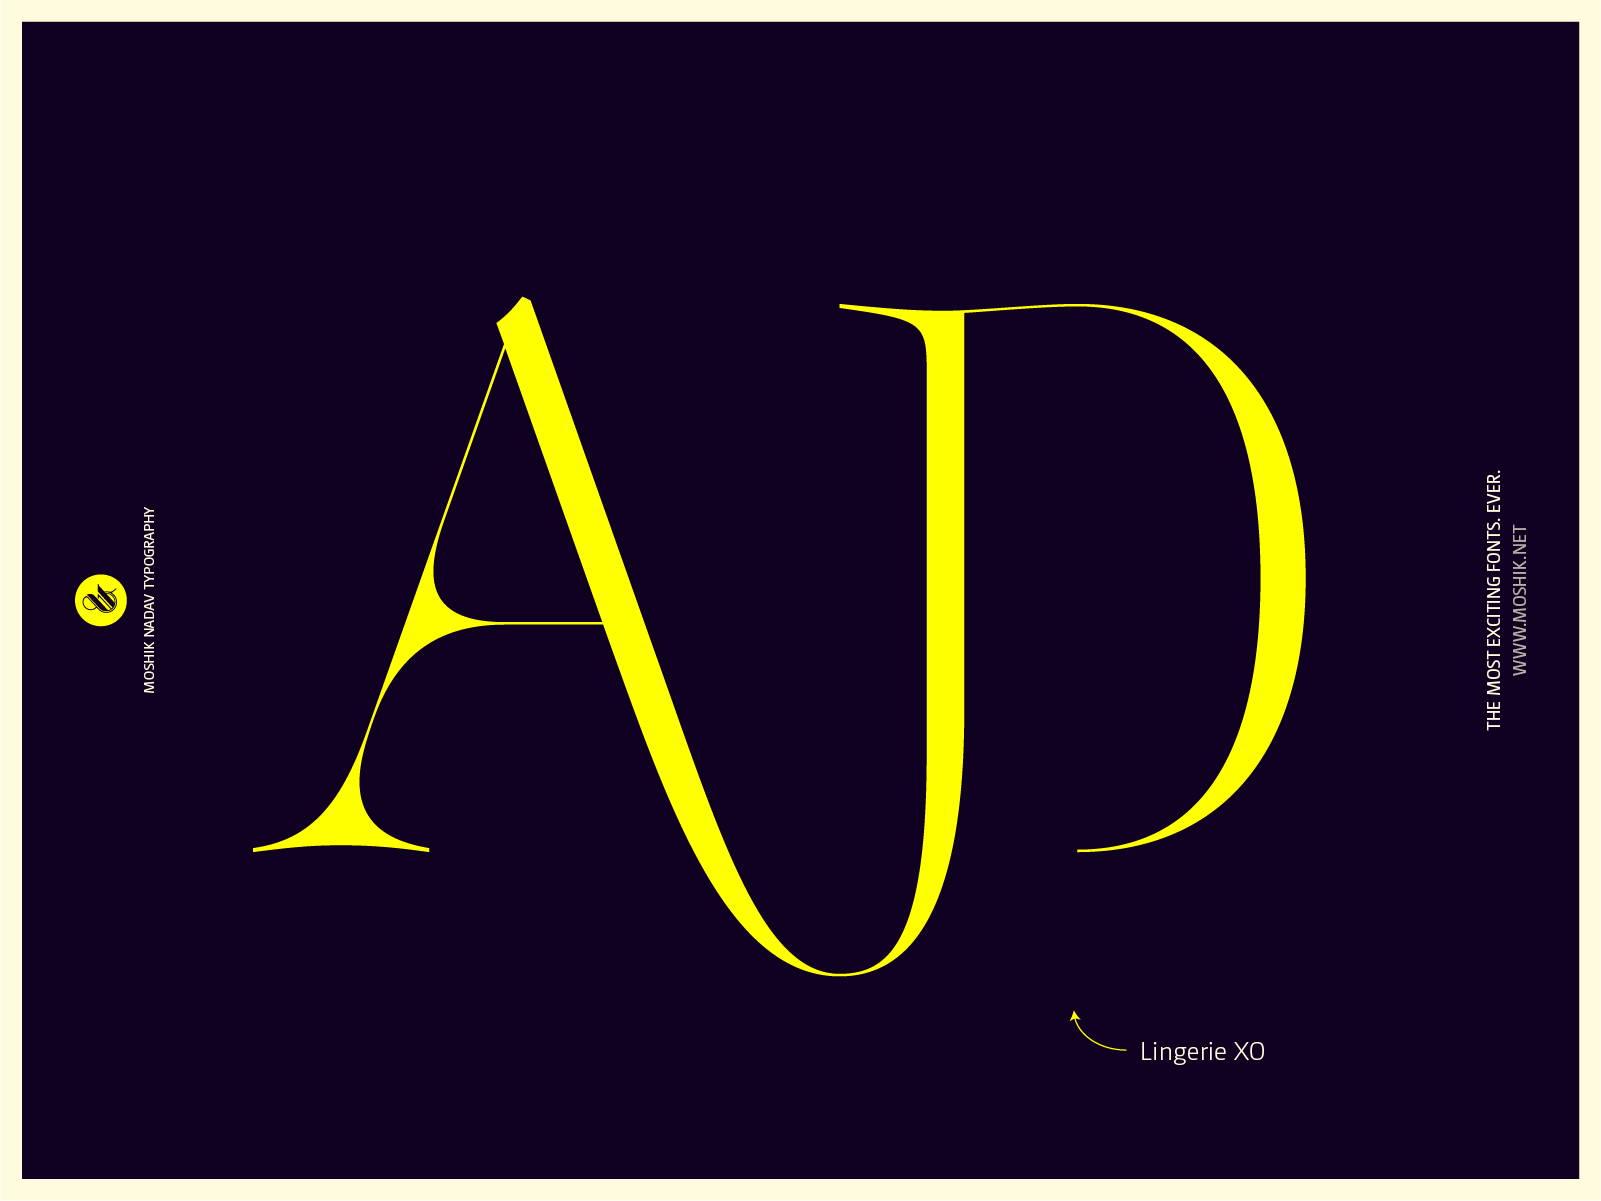 fashion fonts, fashion typography, vogue fonts, must have fonts for fashion, best fonts 2021, must have fonts 2021, Fashion logos, vogue fonts, fashion magazine fonts, sexy logos, sexy fashion logo, fashion ligatures